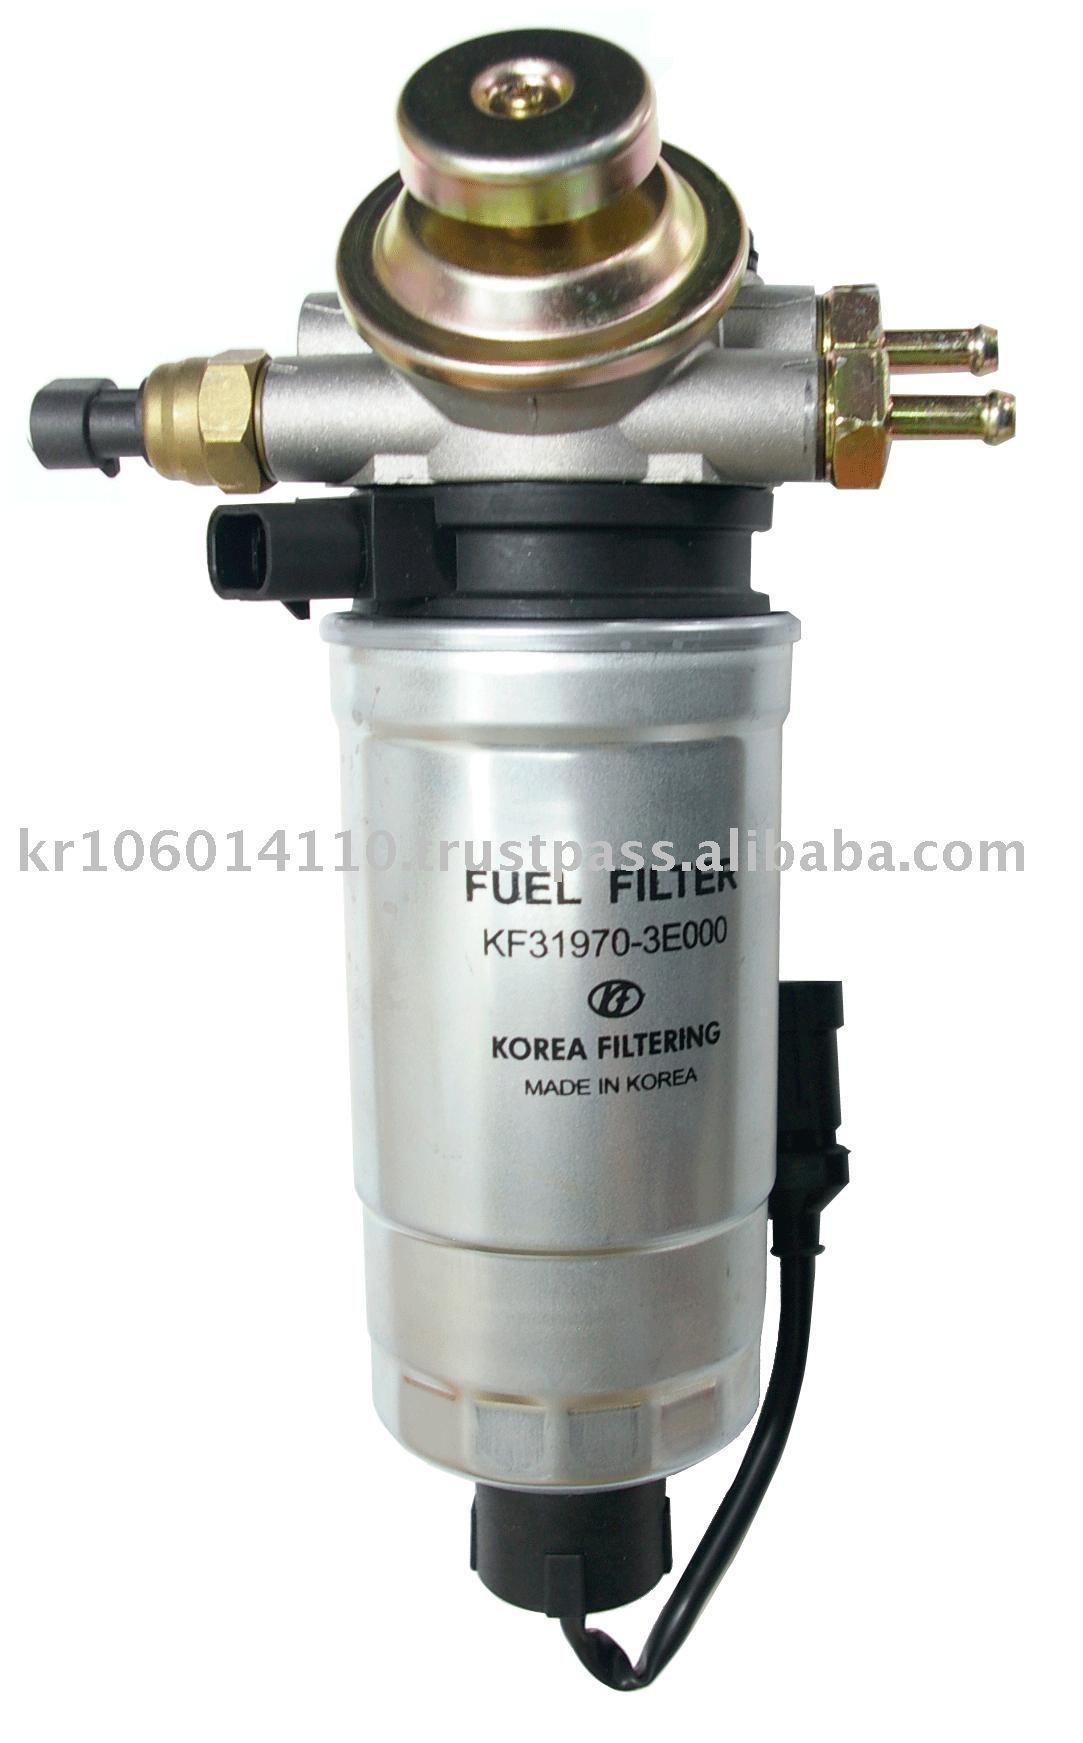 Crdi Fuel Filter(sorento {kia} ) - Buy Fuel Filter,Crdi Auto Filter,Kia  Product on Alibaba.com